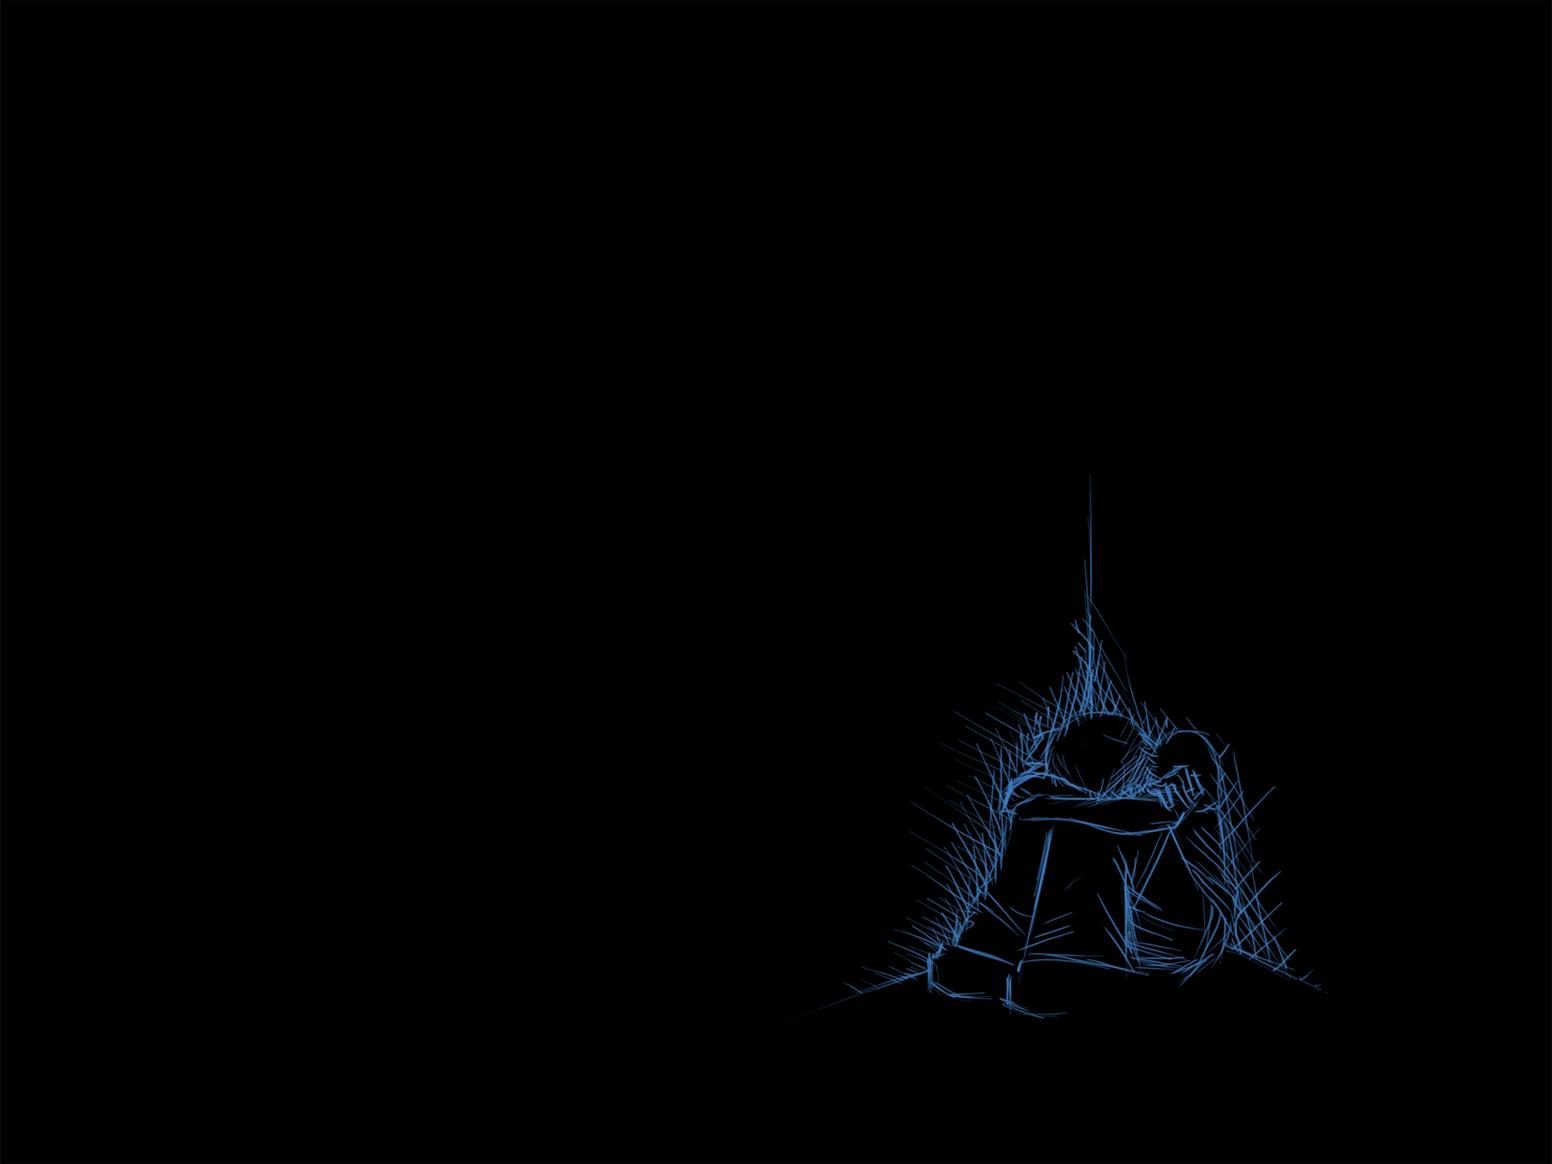 sad alone solitude boy jpg alone and sad boy profile 1552x1164